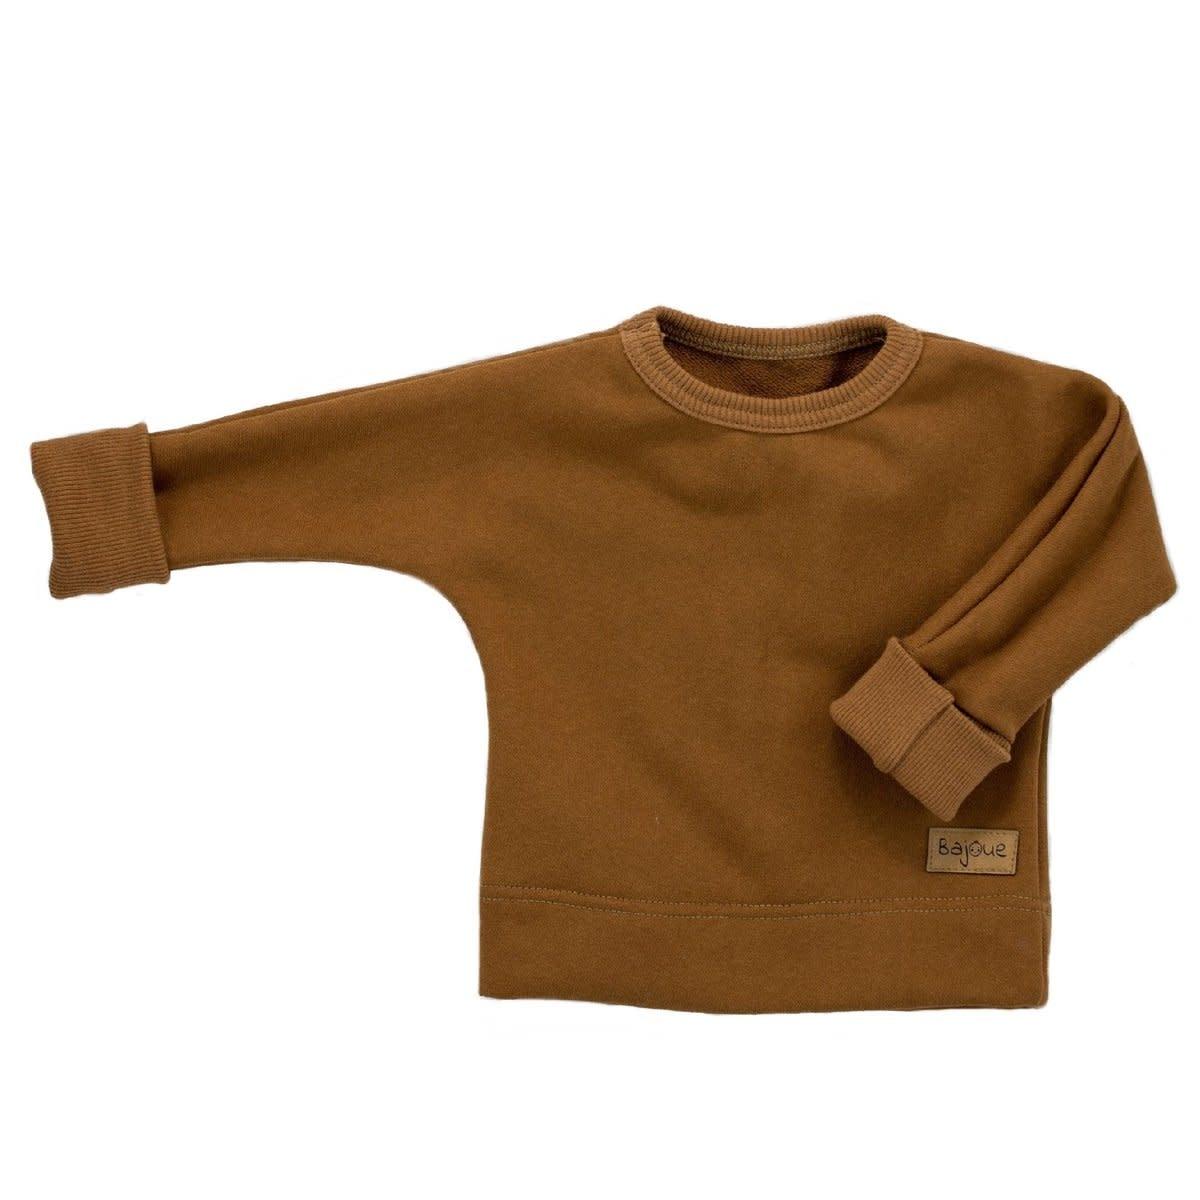 Bajoue Clay Evolutive Sweater